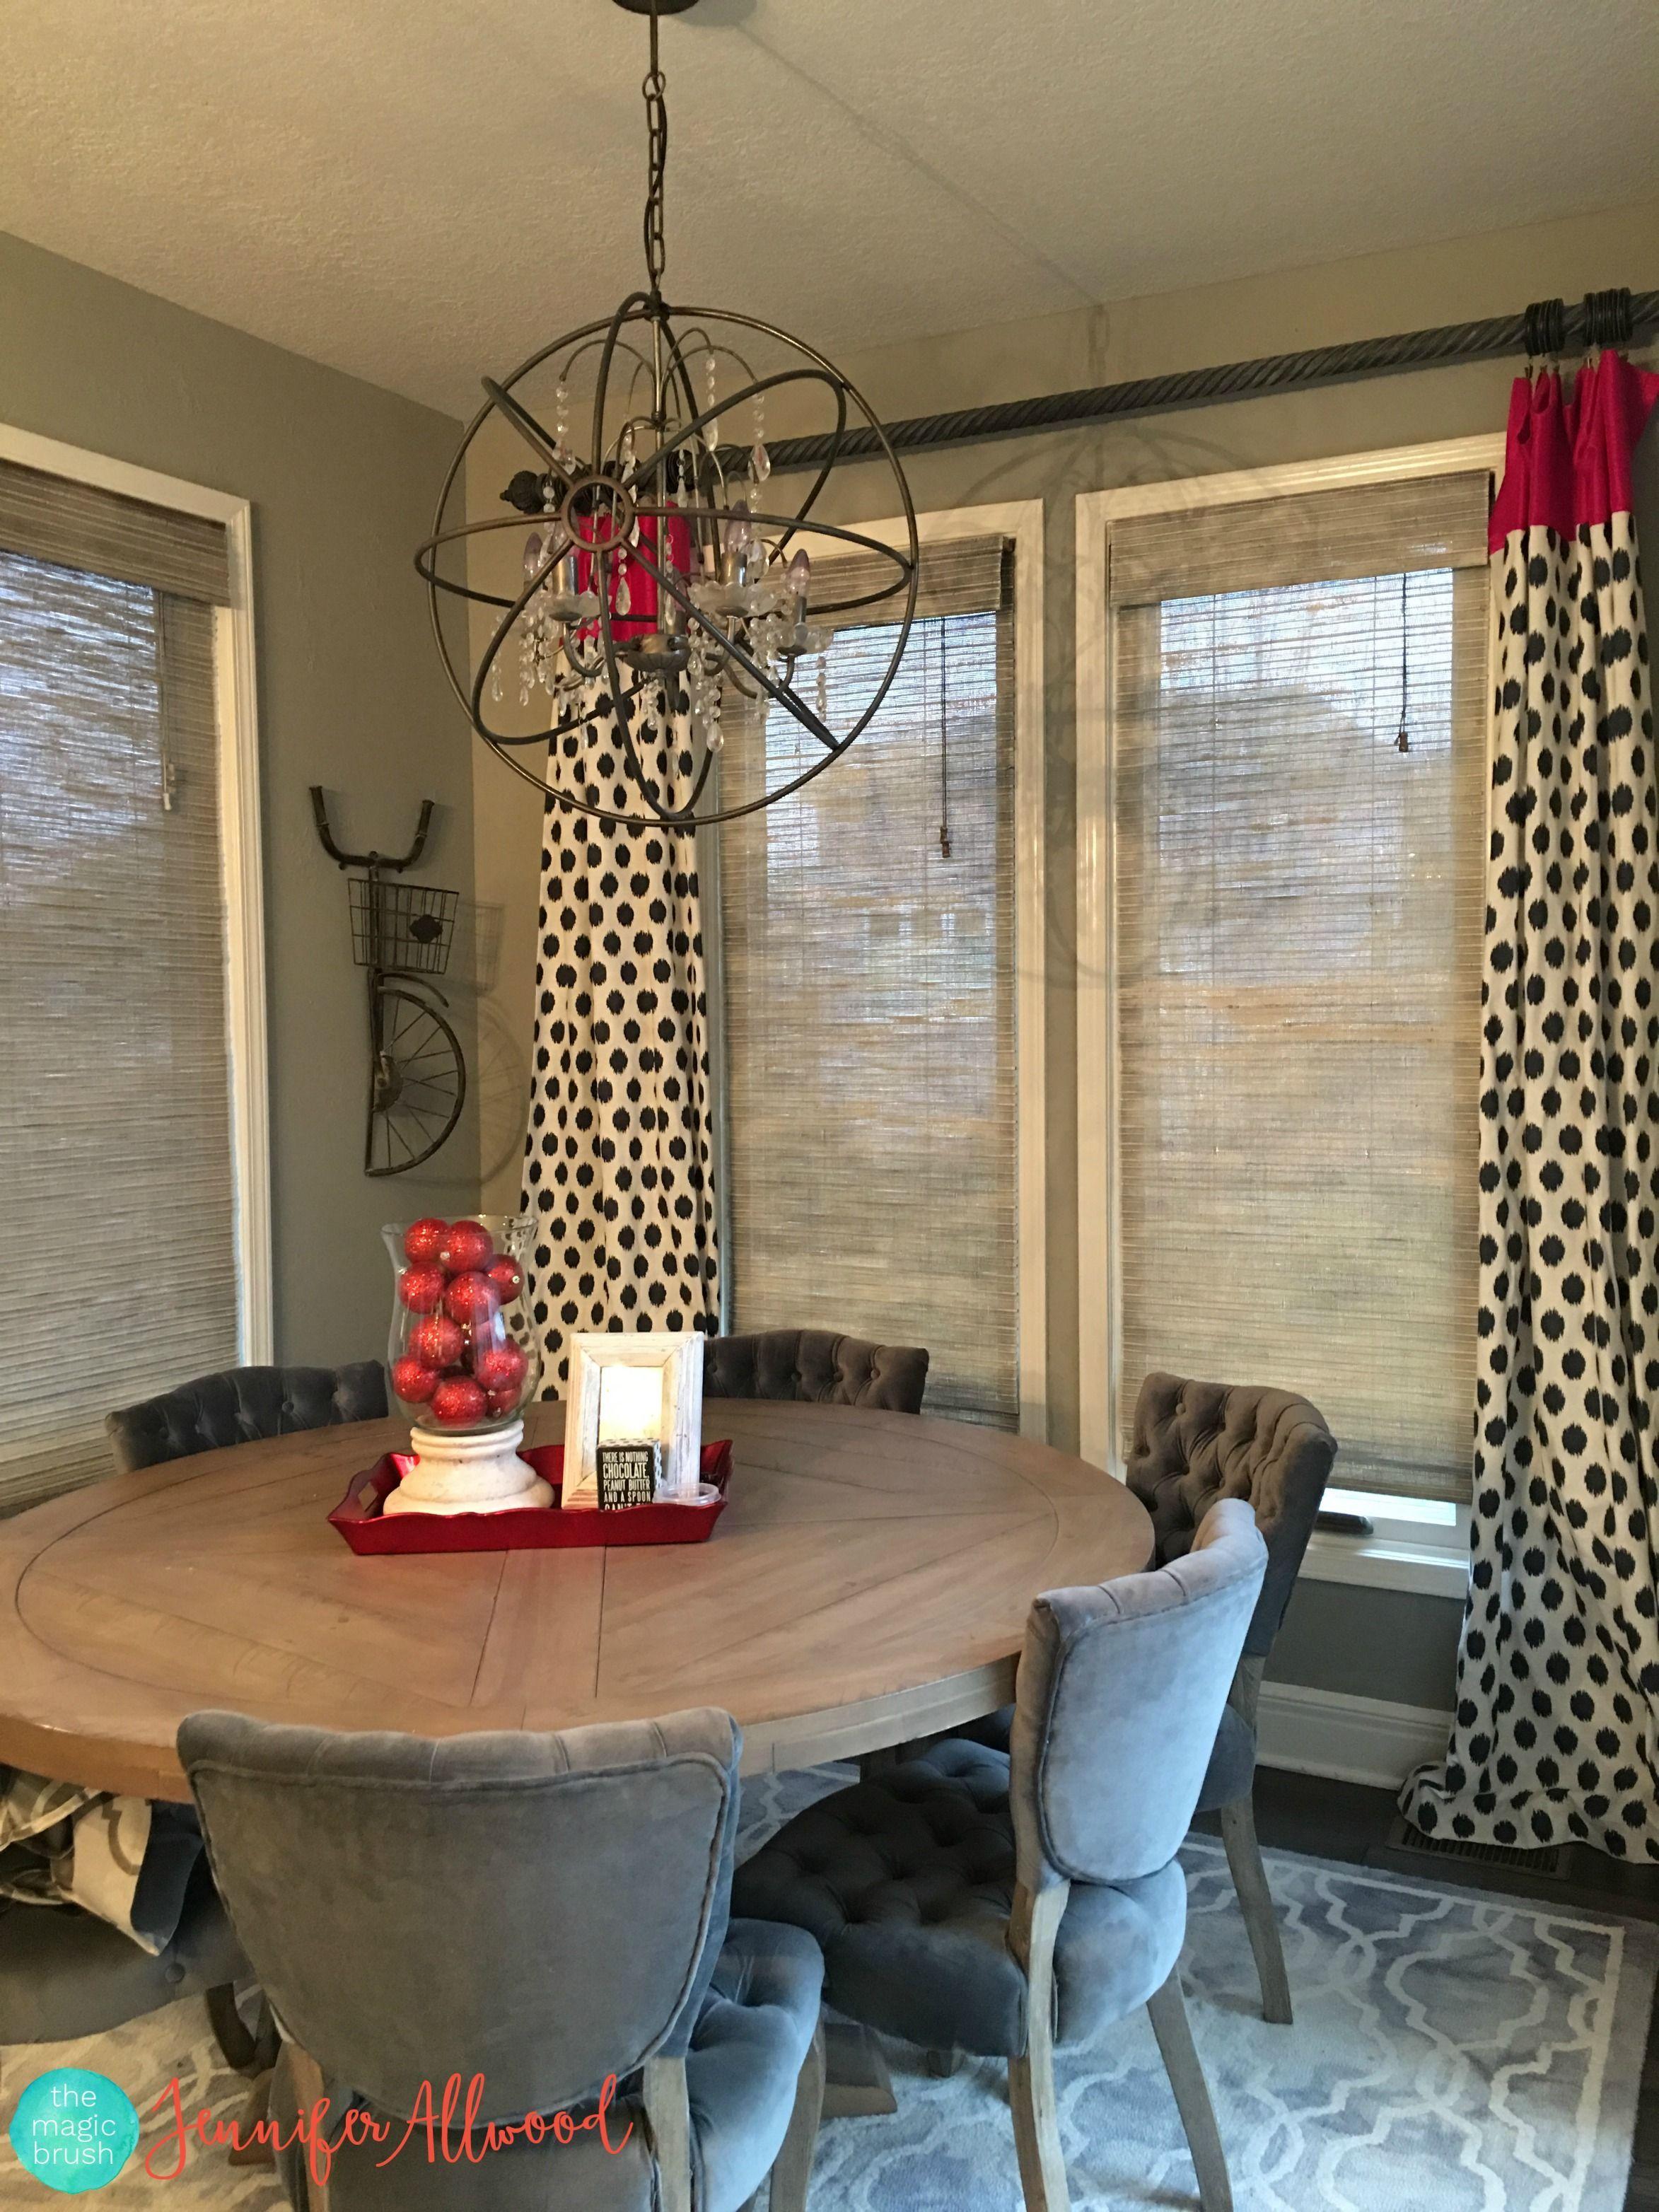 Window dressing ideas for arched windows  marvelous tips bedroom blinds venetian cream roller blindsdiy